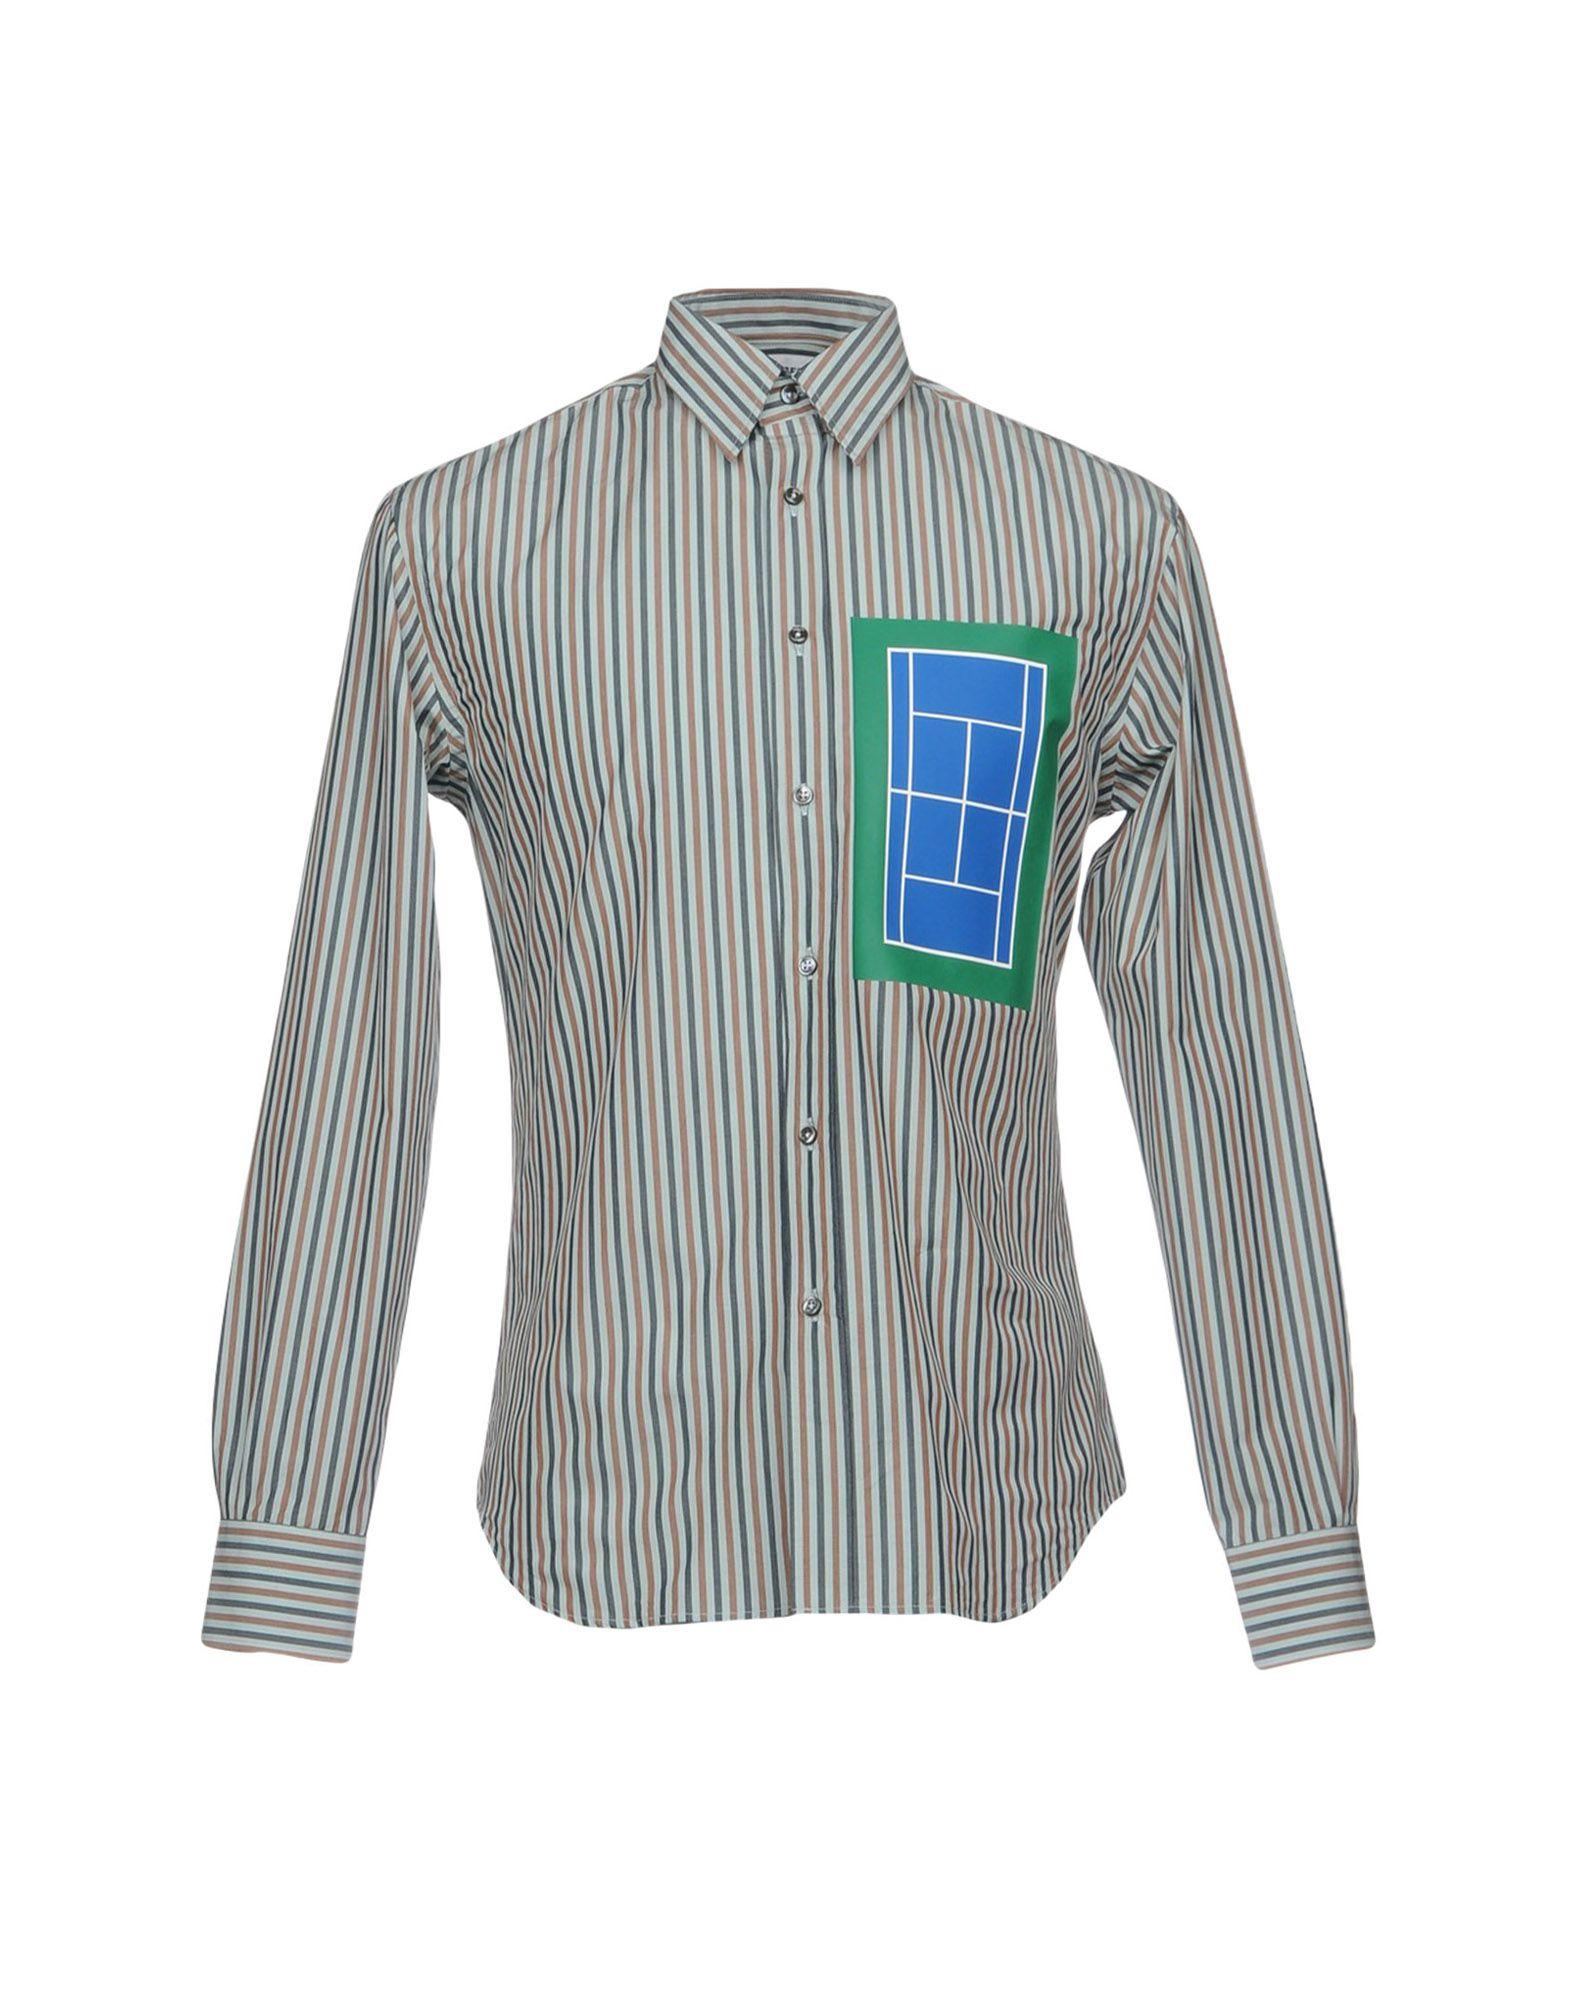 Camicia A Righe Umit Benan Uomo - Acquista online su